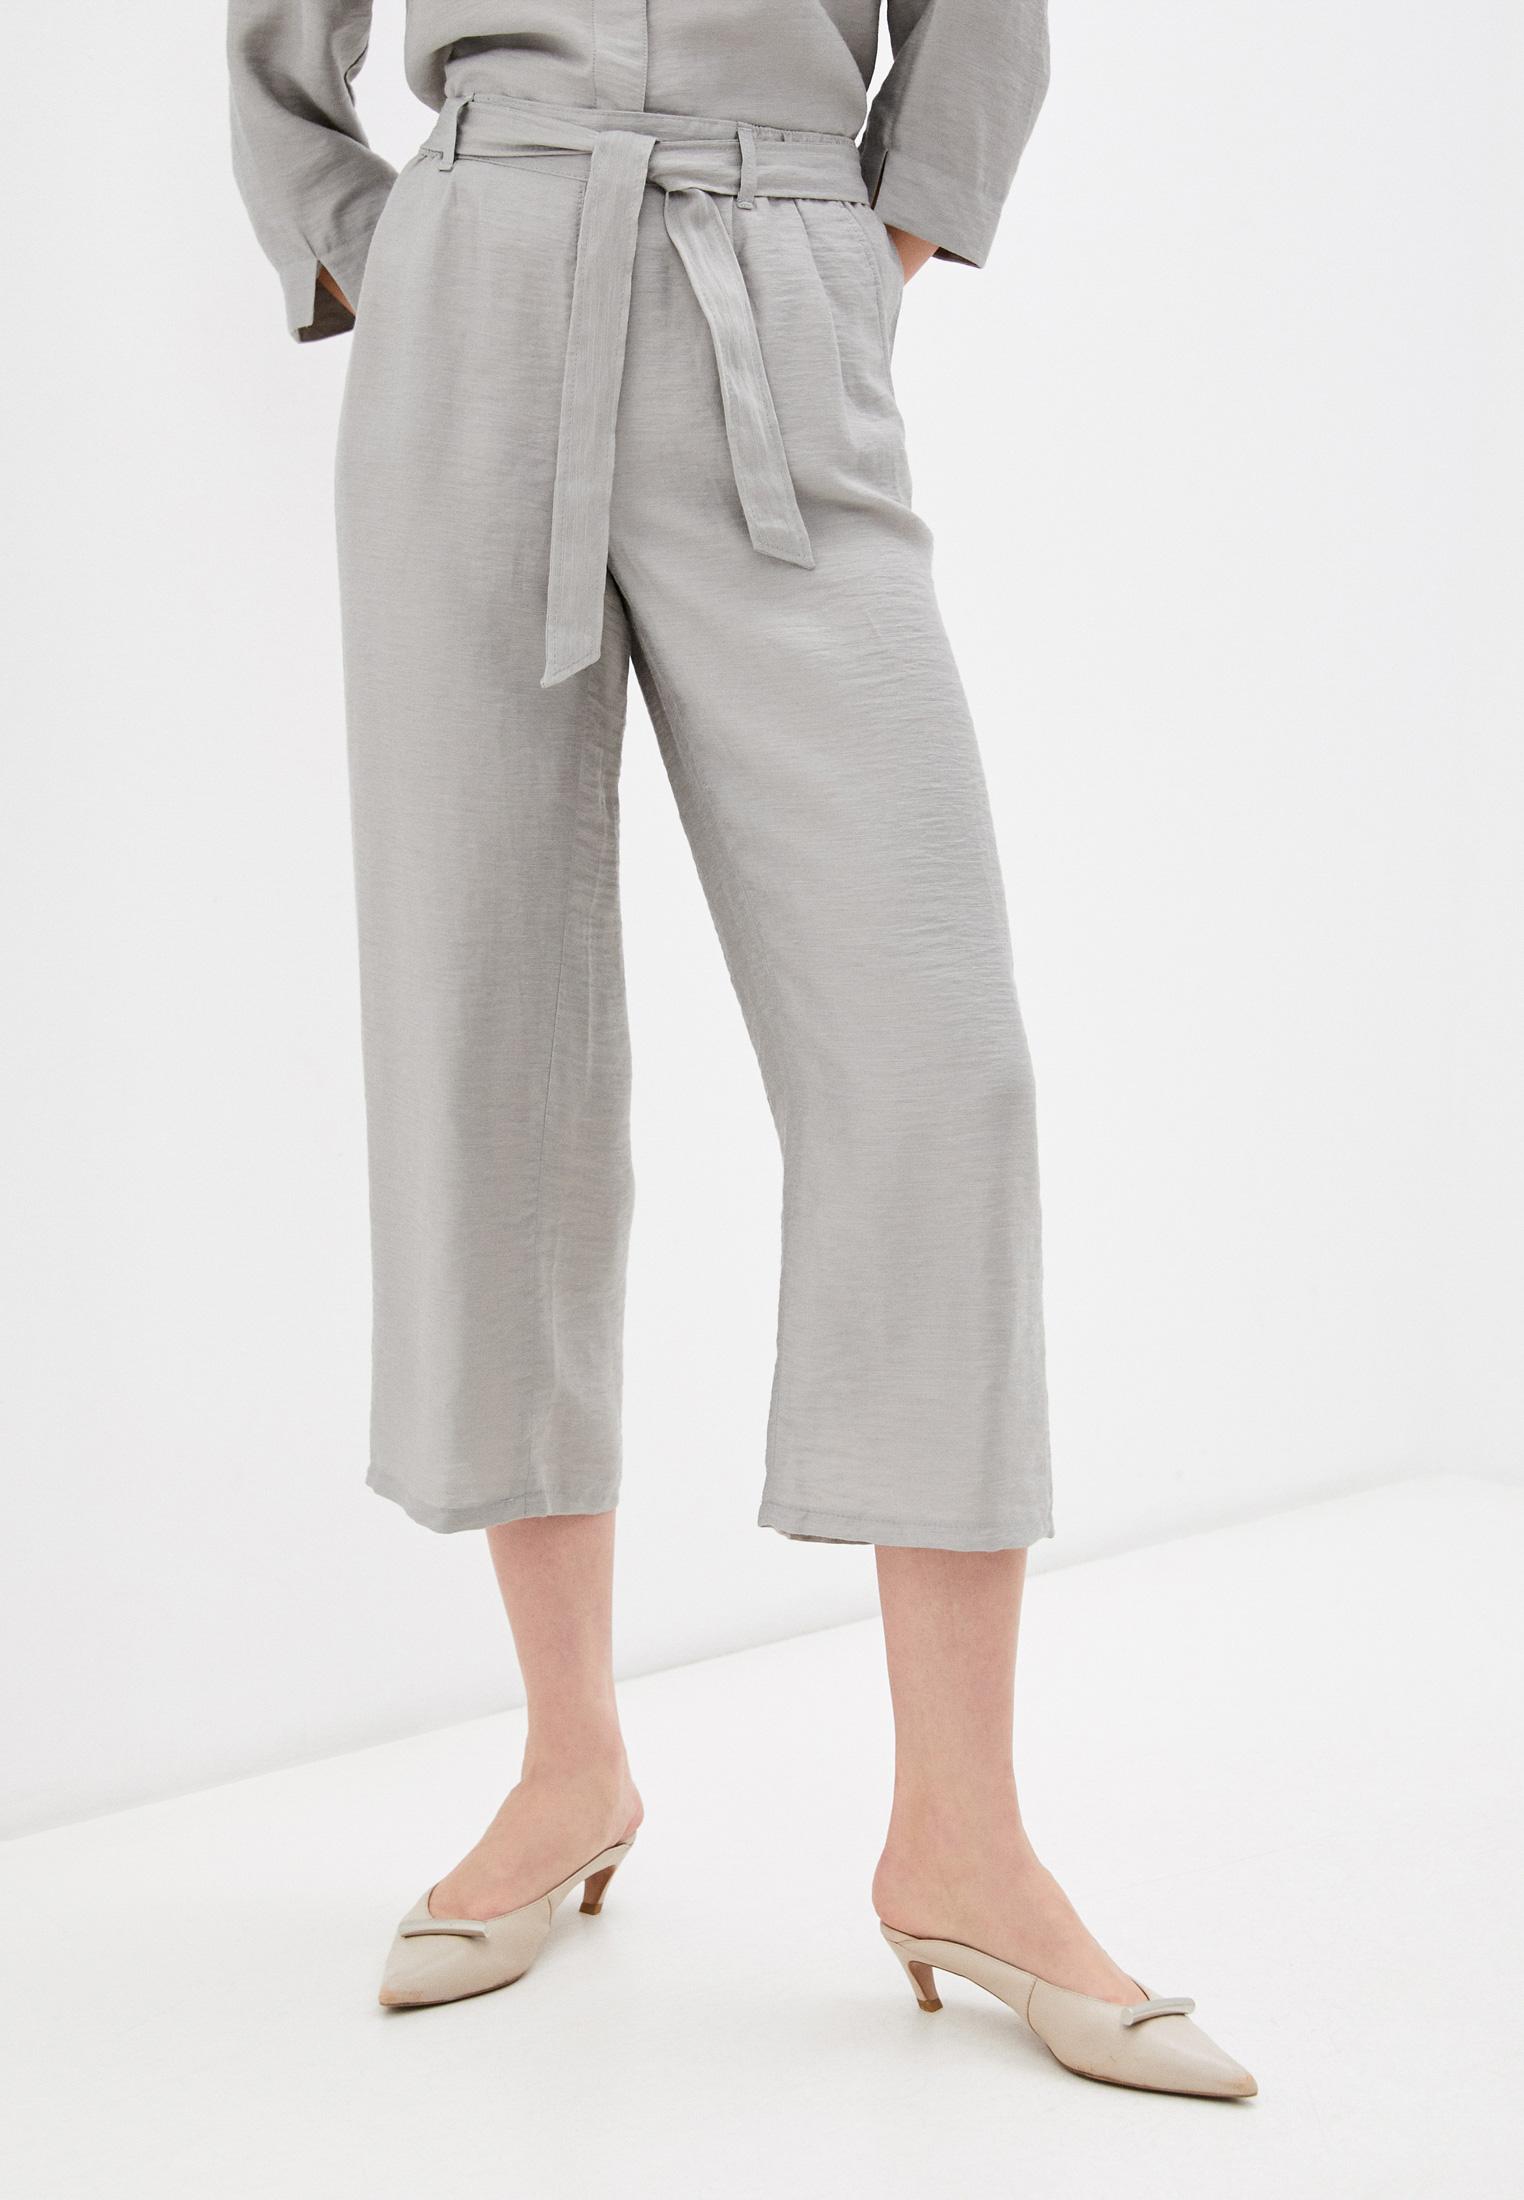 Женские прямые брюки Betty Barclay 6439/2045